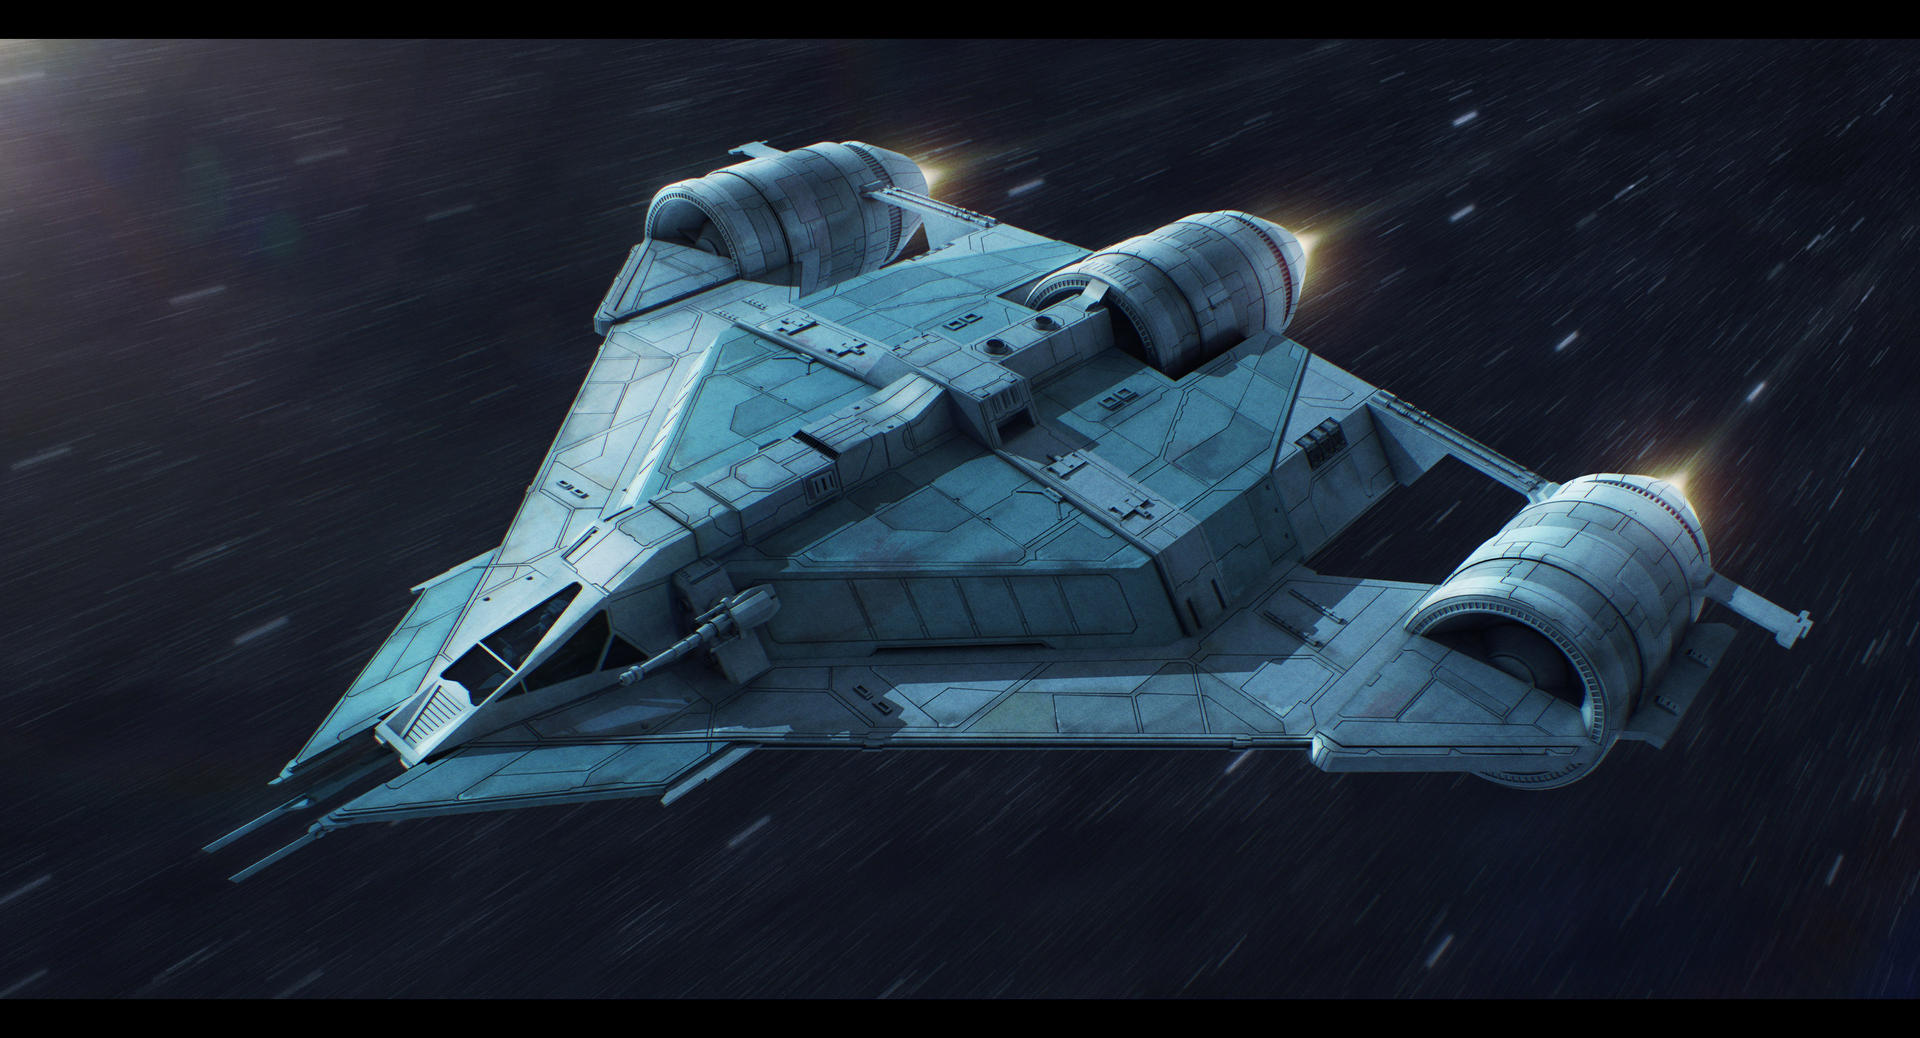 Star Wars Koros Spaceworks LH802 light hauler by AdamKop